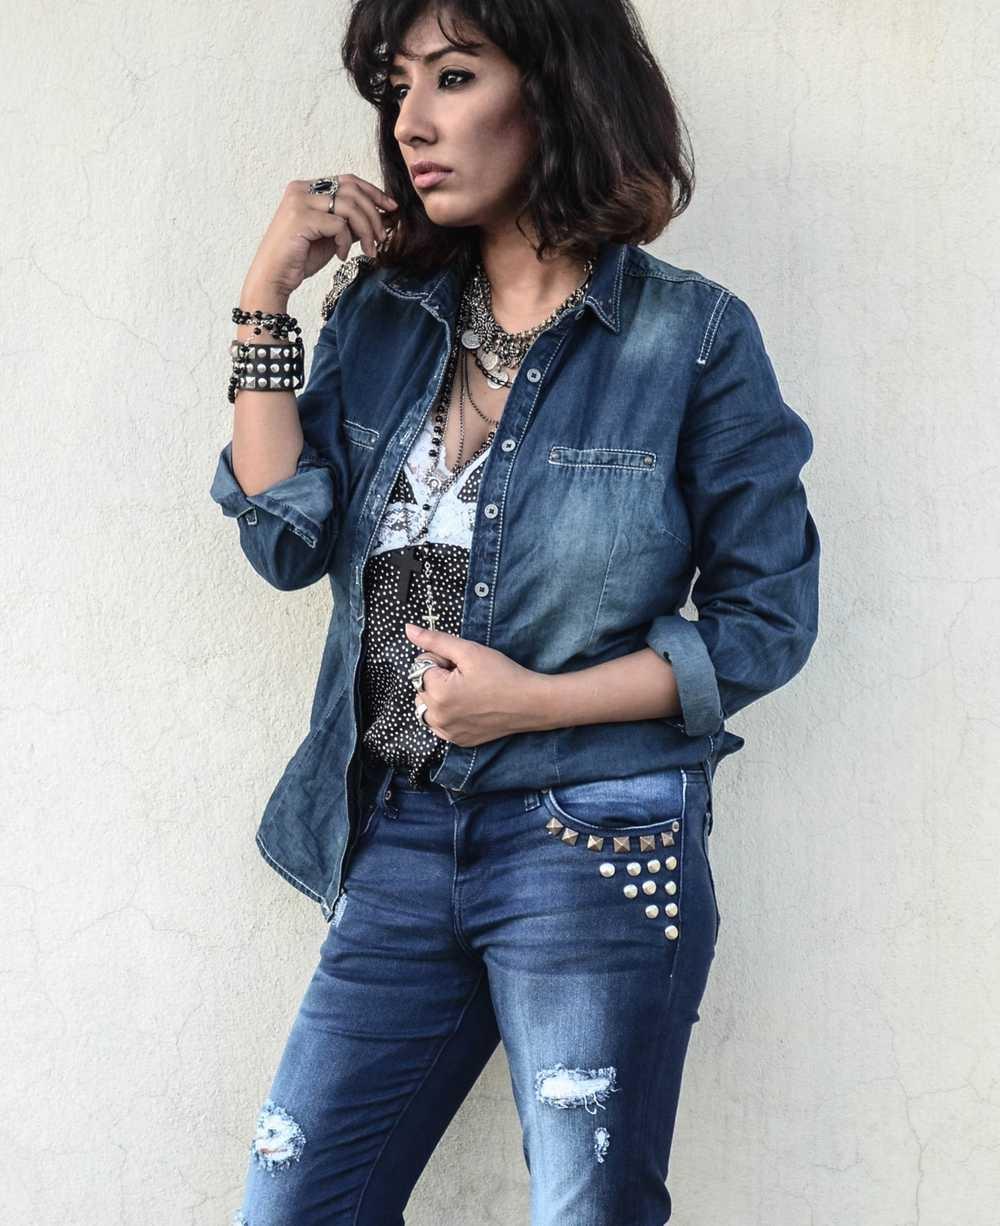 Denim Outfit - langkung.com